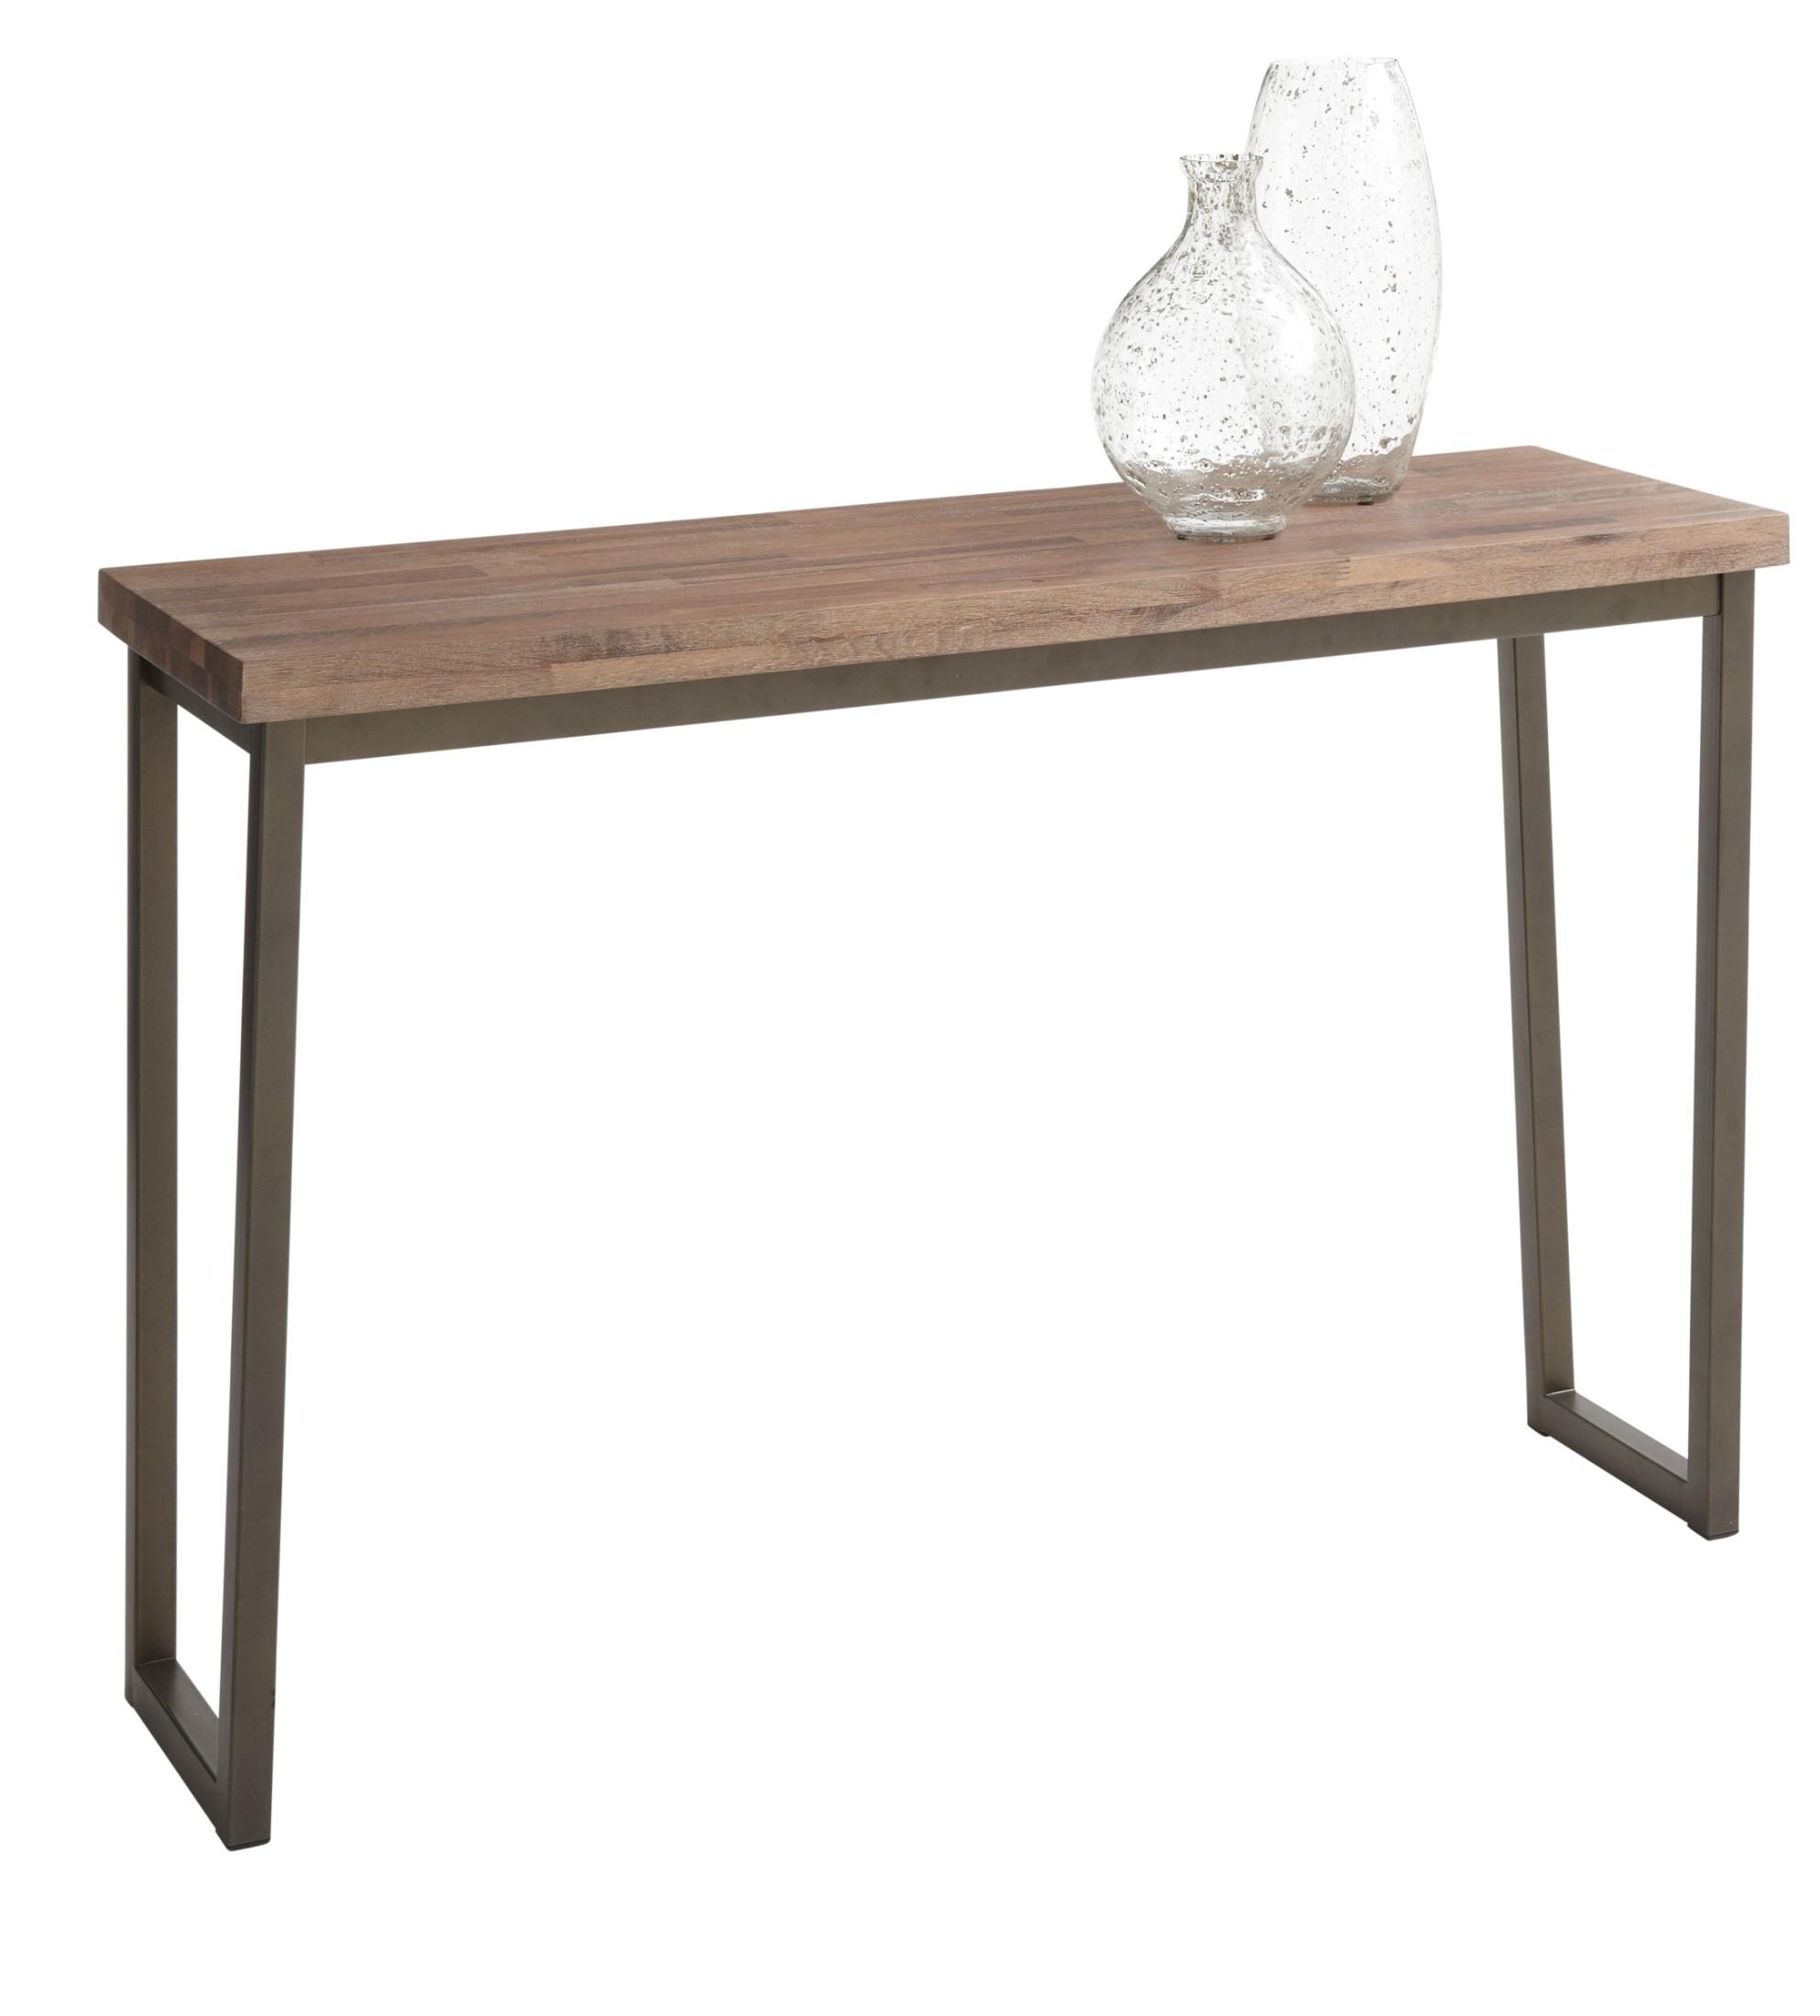 Porto Console Table from Sunpan (94263)  Coleman Furniture